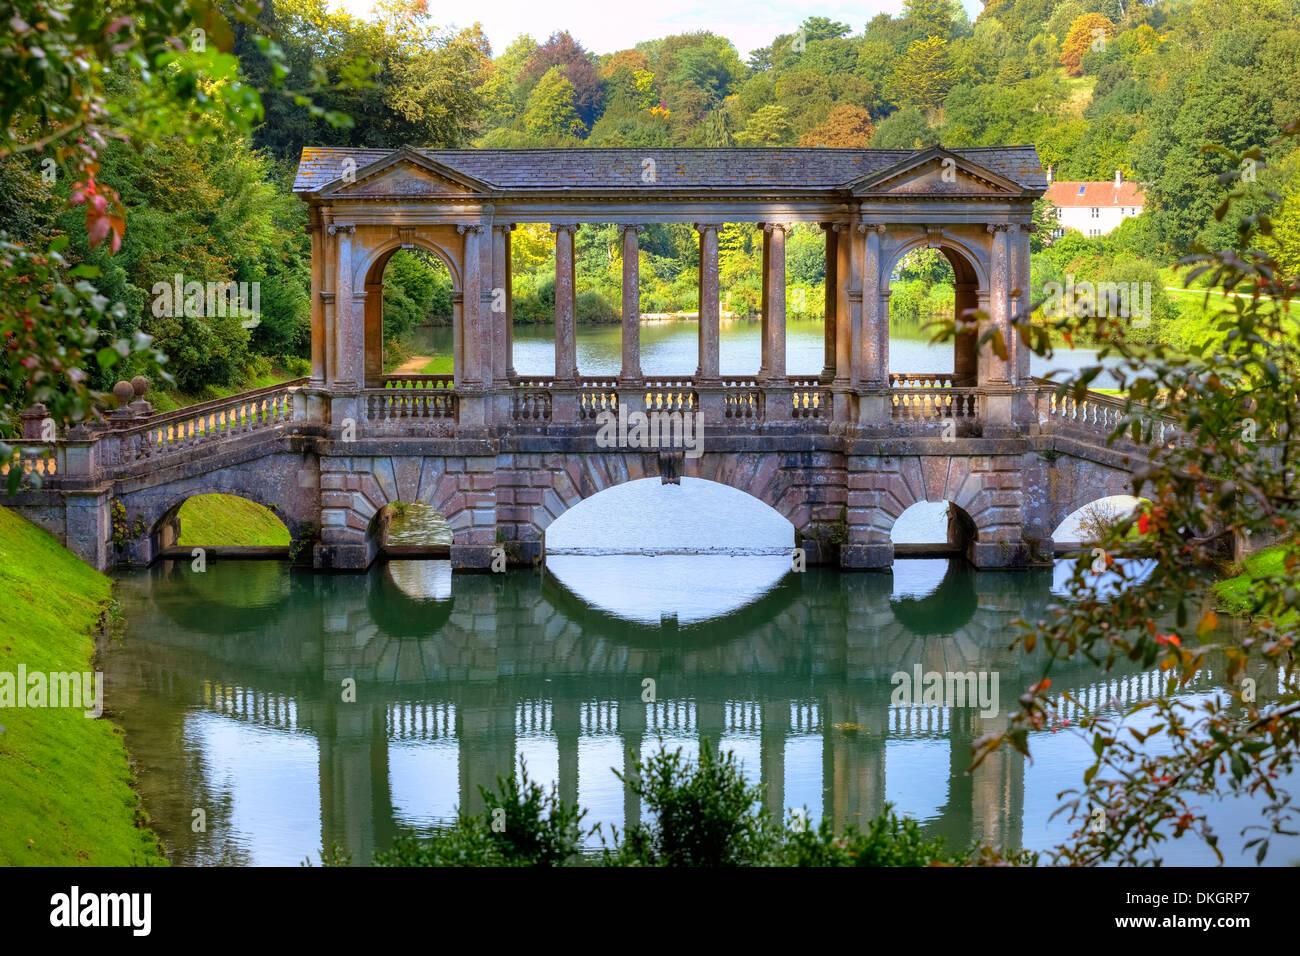 Prior Park, Bath, Somerset, England, United Kingdom - Stock Image